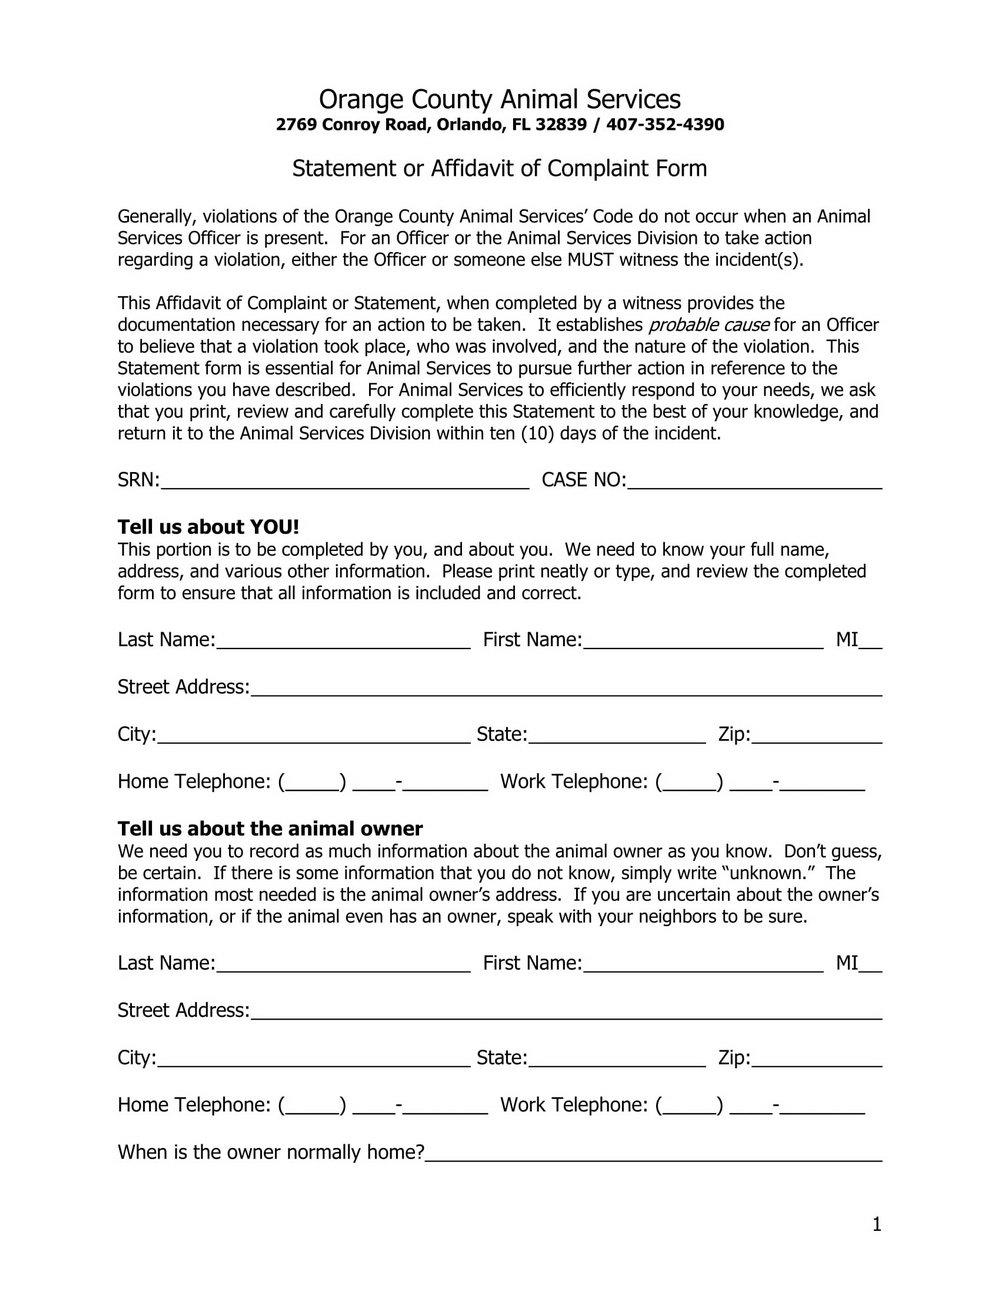 Complaint Affidavit Sample Format